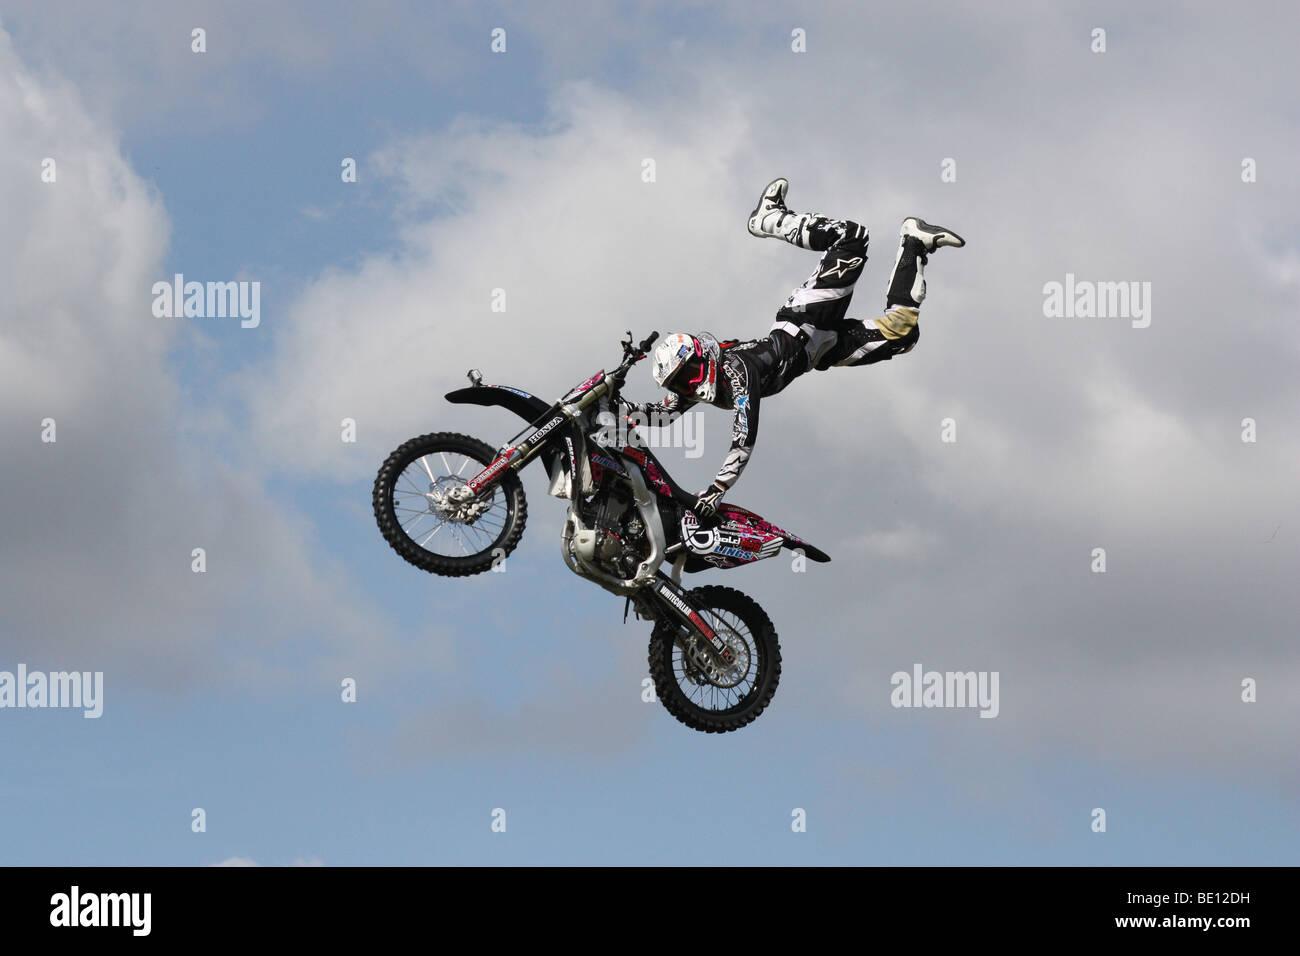 Motor cycle stunt display Romsey Show Hampshire UK 2009 Stock Photo